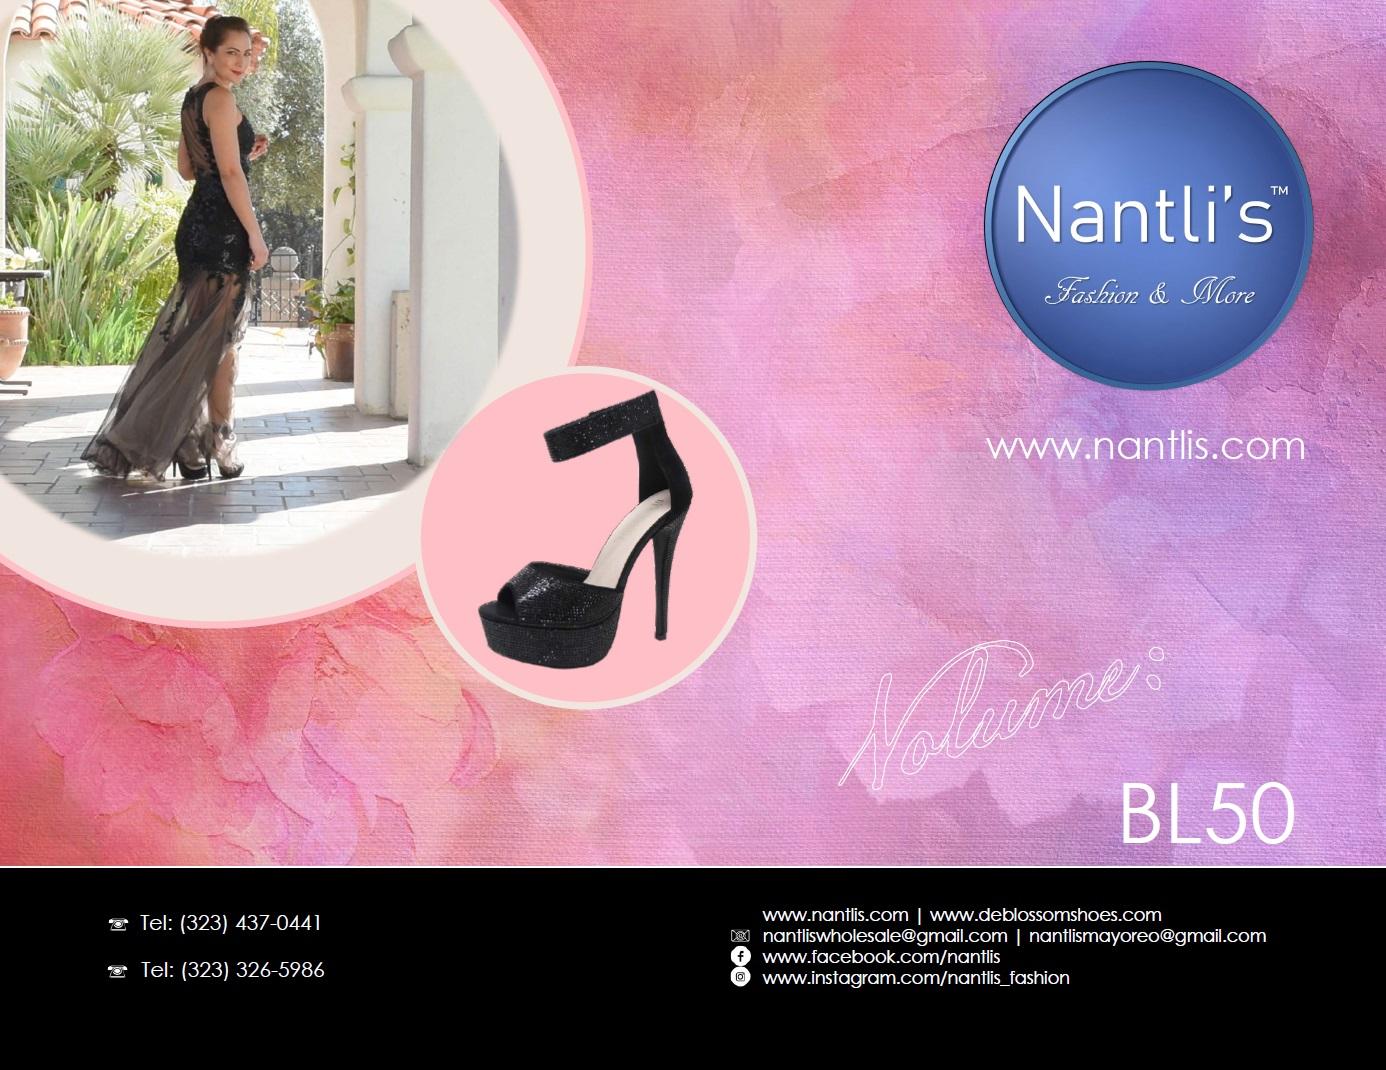 Nantlis Vol BL50 Zapatos de Mujer mayoreo Catalogo Wholesale womens Shoes_Page_01